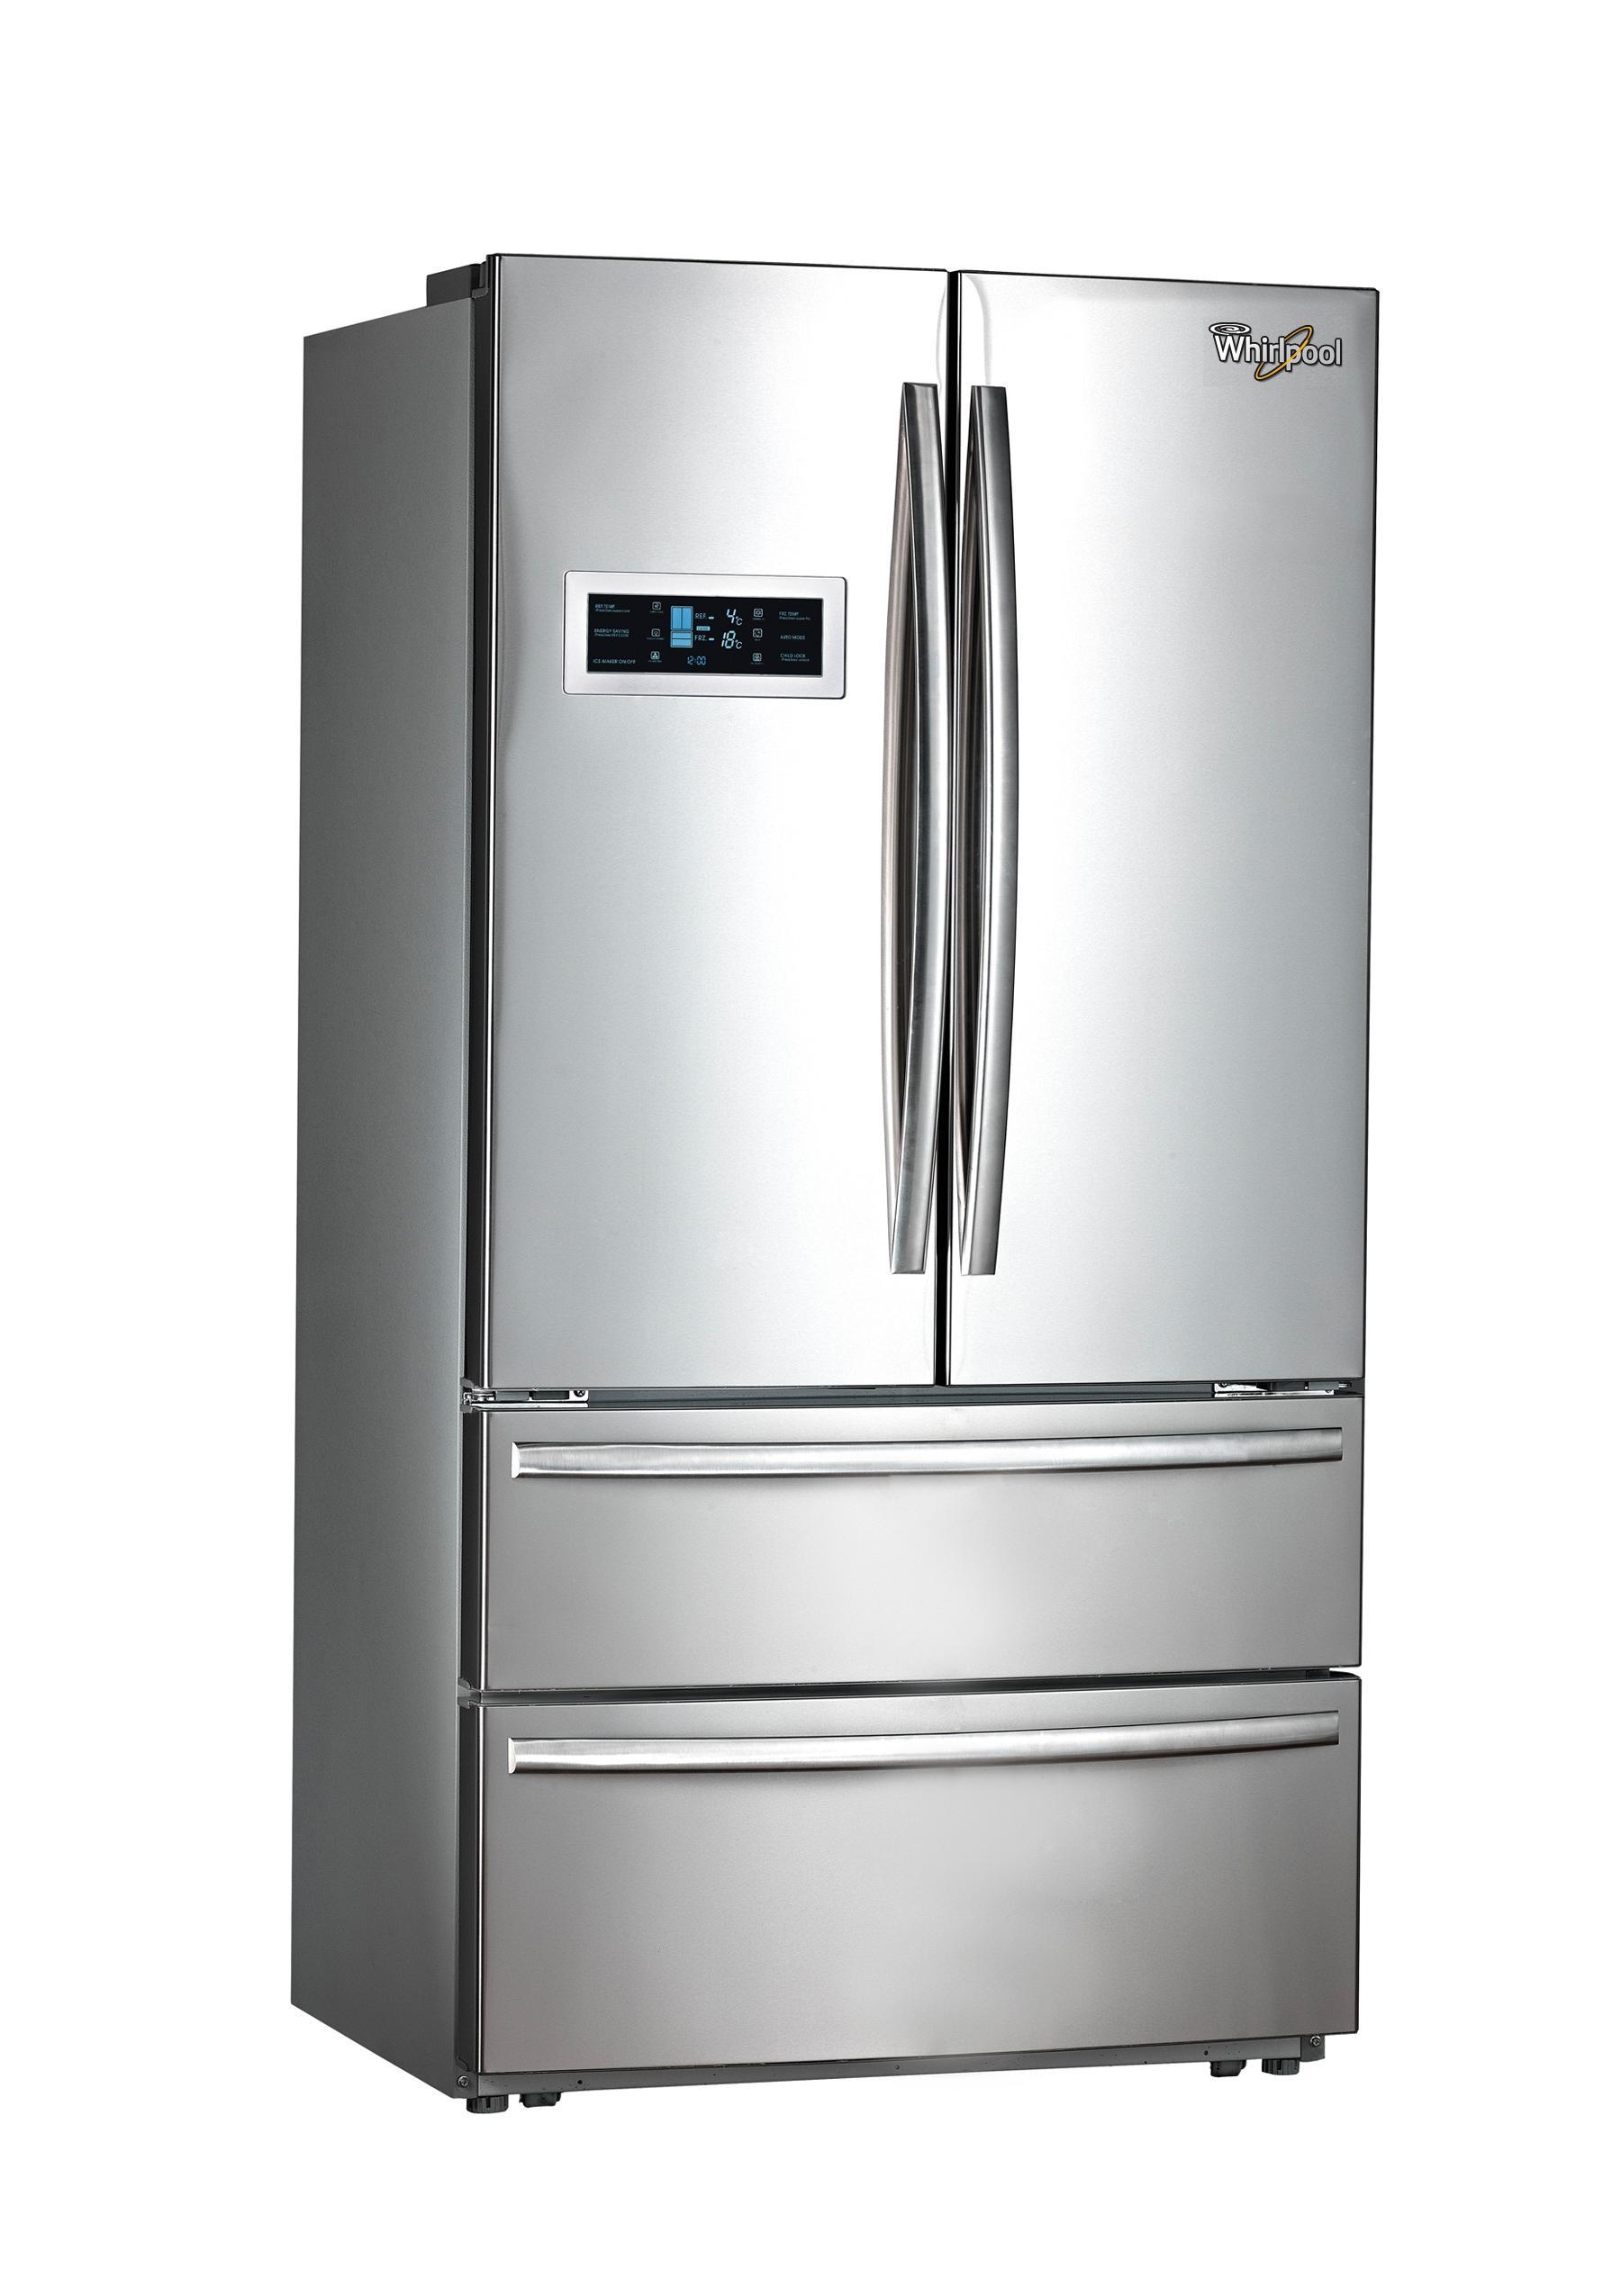 Whirlpool Refrigerator Customer Care in Noida in Noida